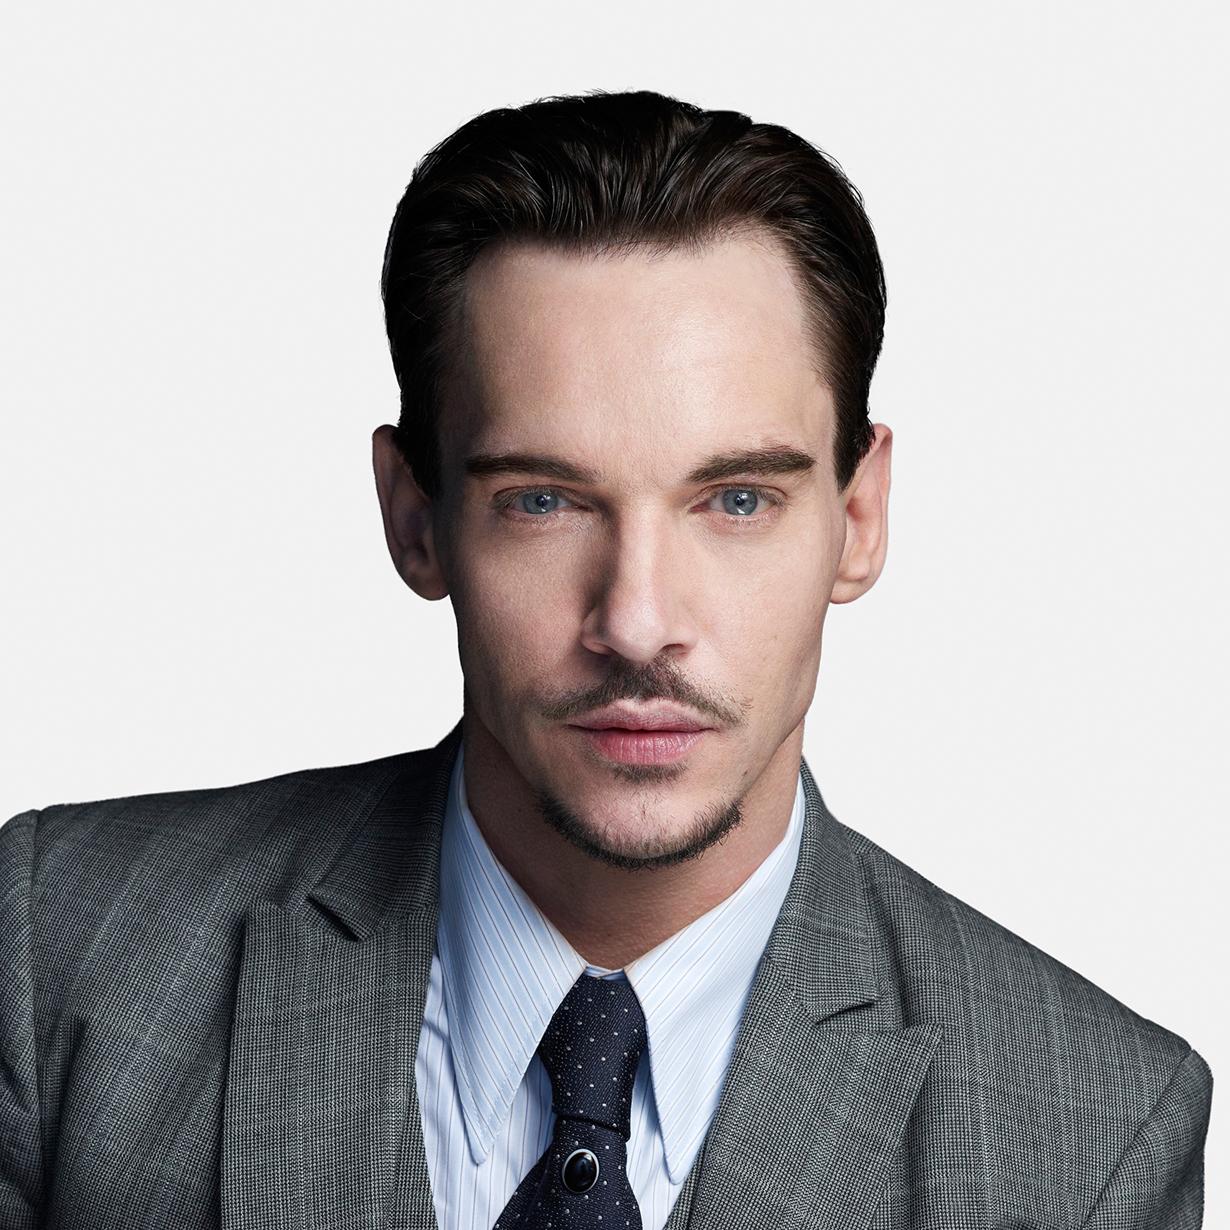 http://www.nbc.com/sites/nbcunbc/files/files/images/2013/12/10/NBC-Dracula-Jonathan-Rhys-Meyers.jpg